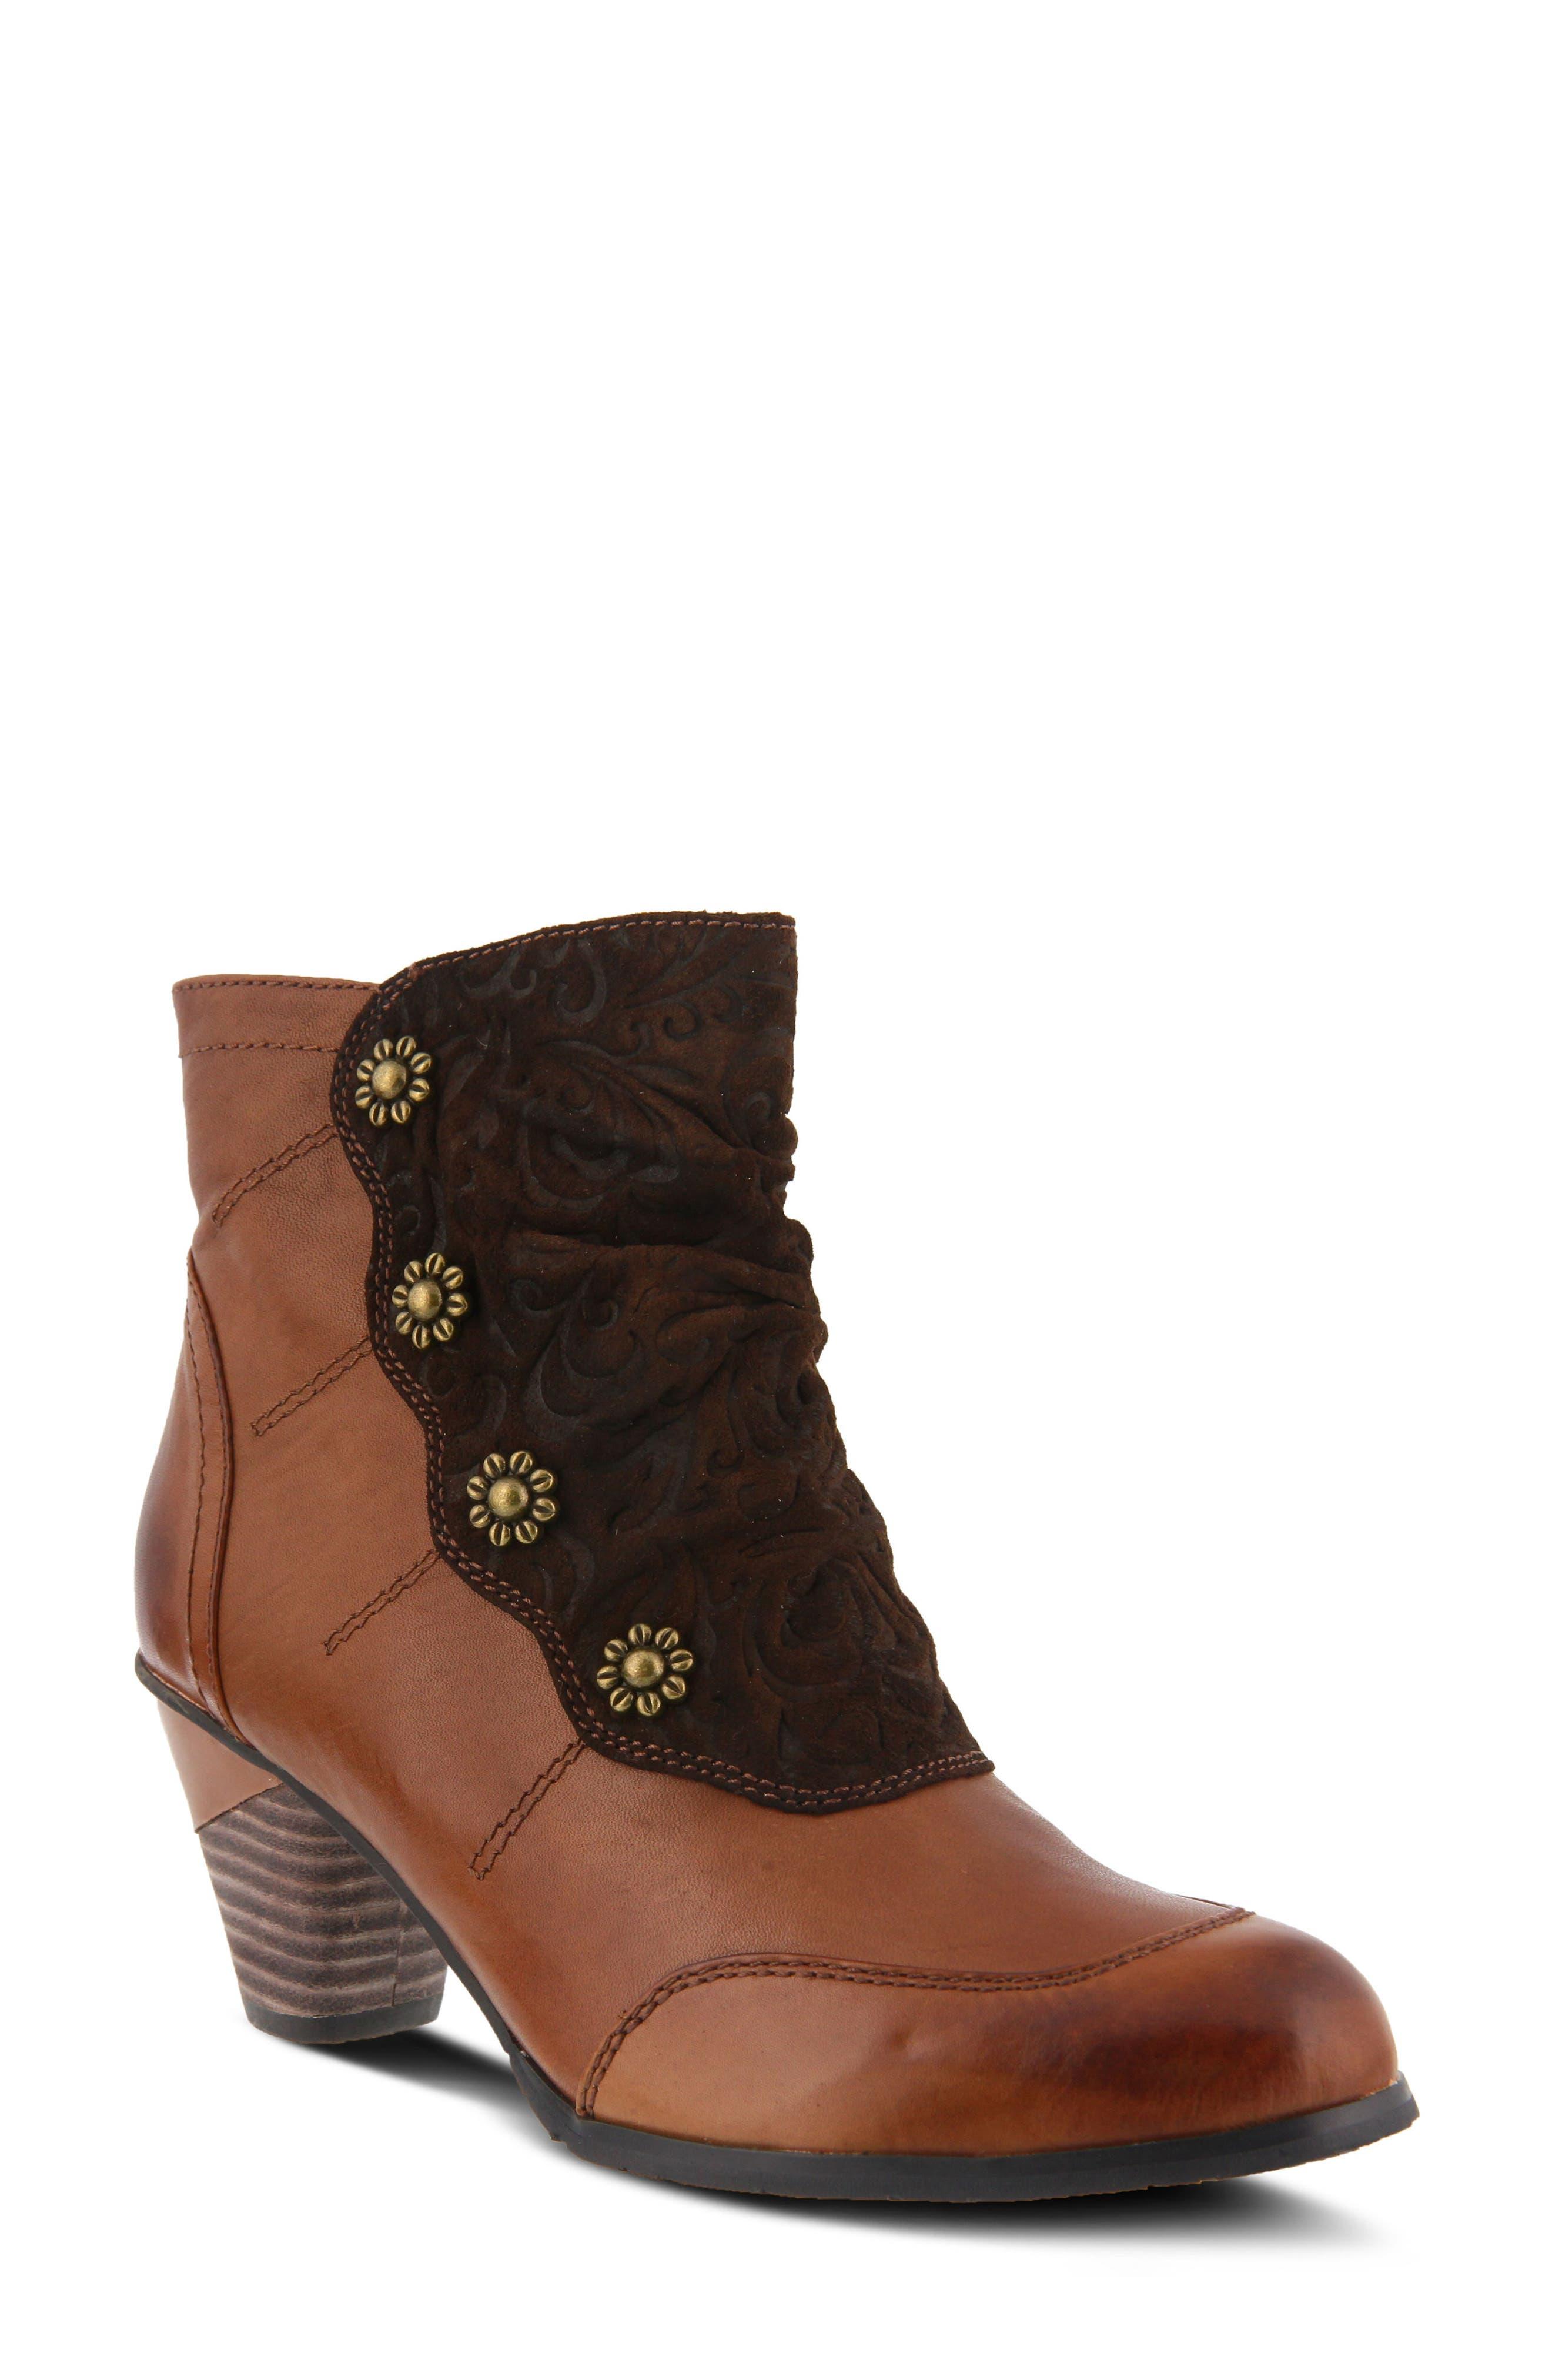 Vintage Boots- Buy Winter Retro Boots Womens LArtiste Belgard Bootie Size 5US  35EU - Brown $139.95 AT vintagedancer.com